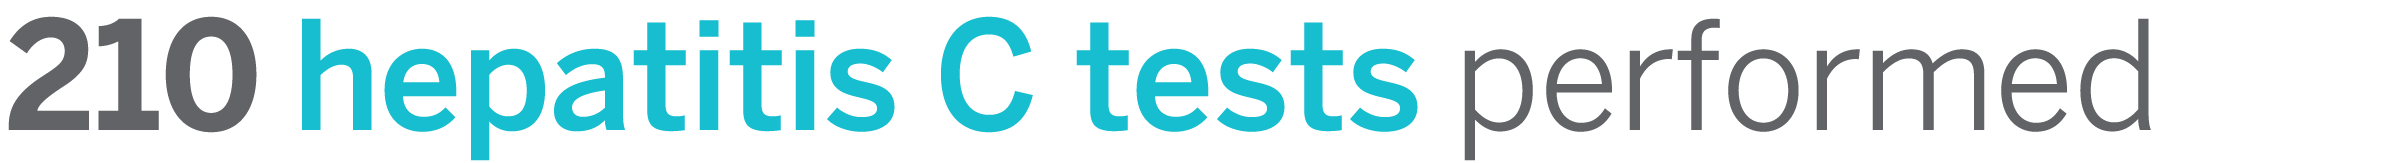 210 hepatitis C test performed